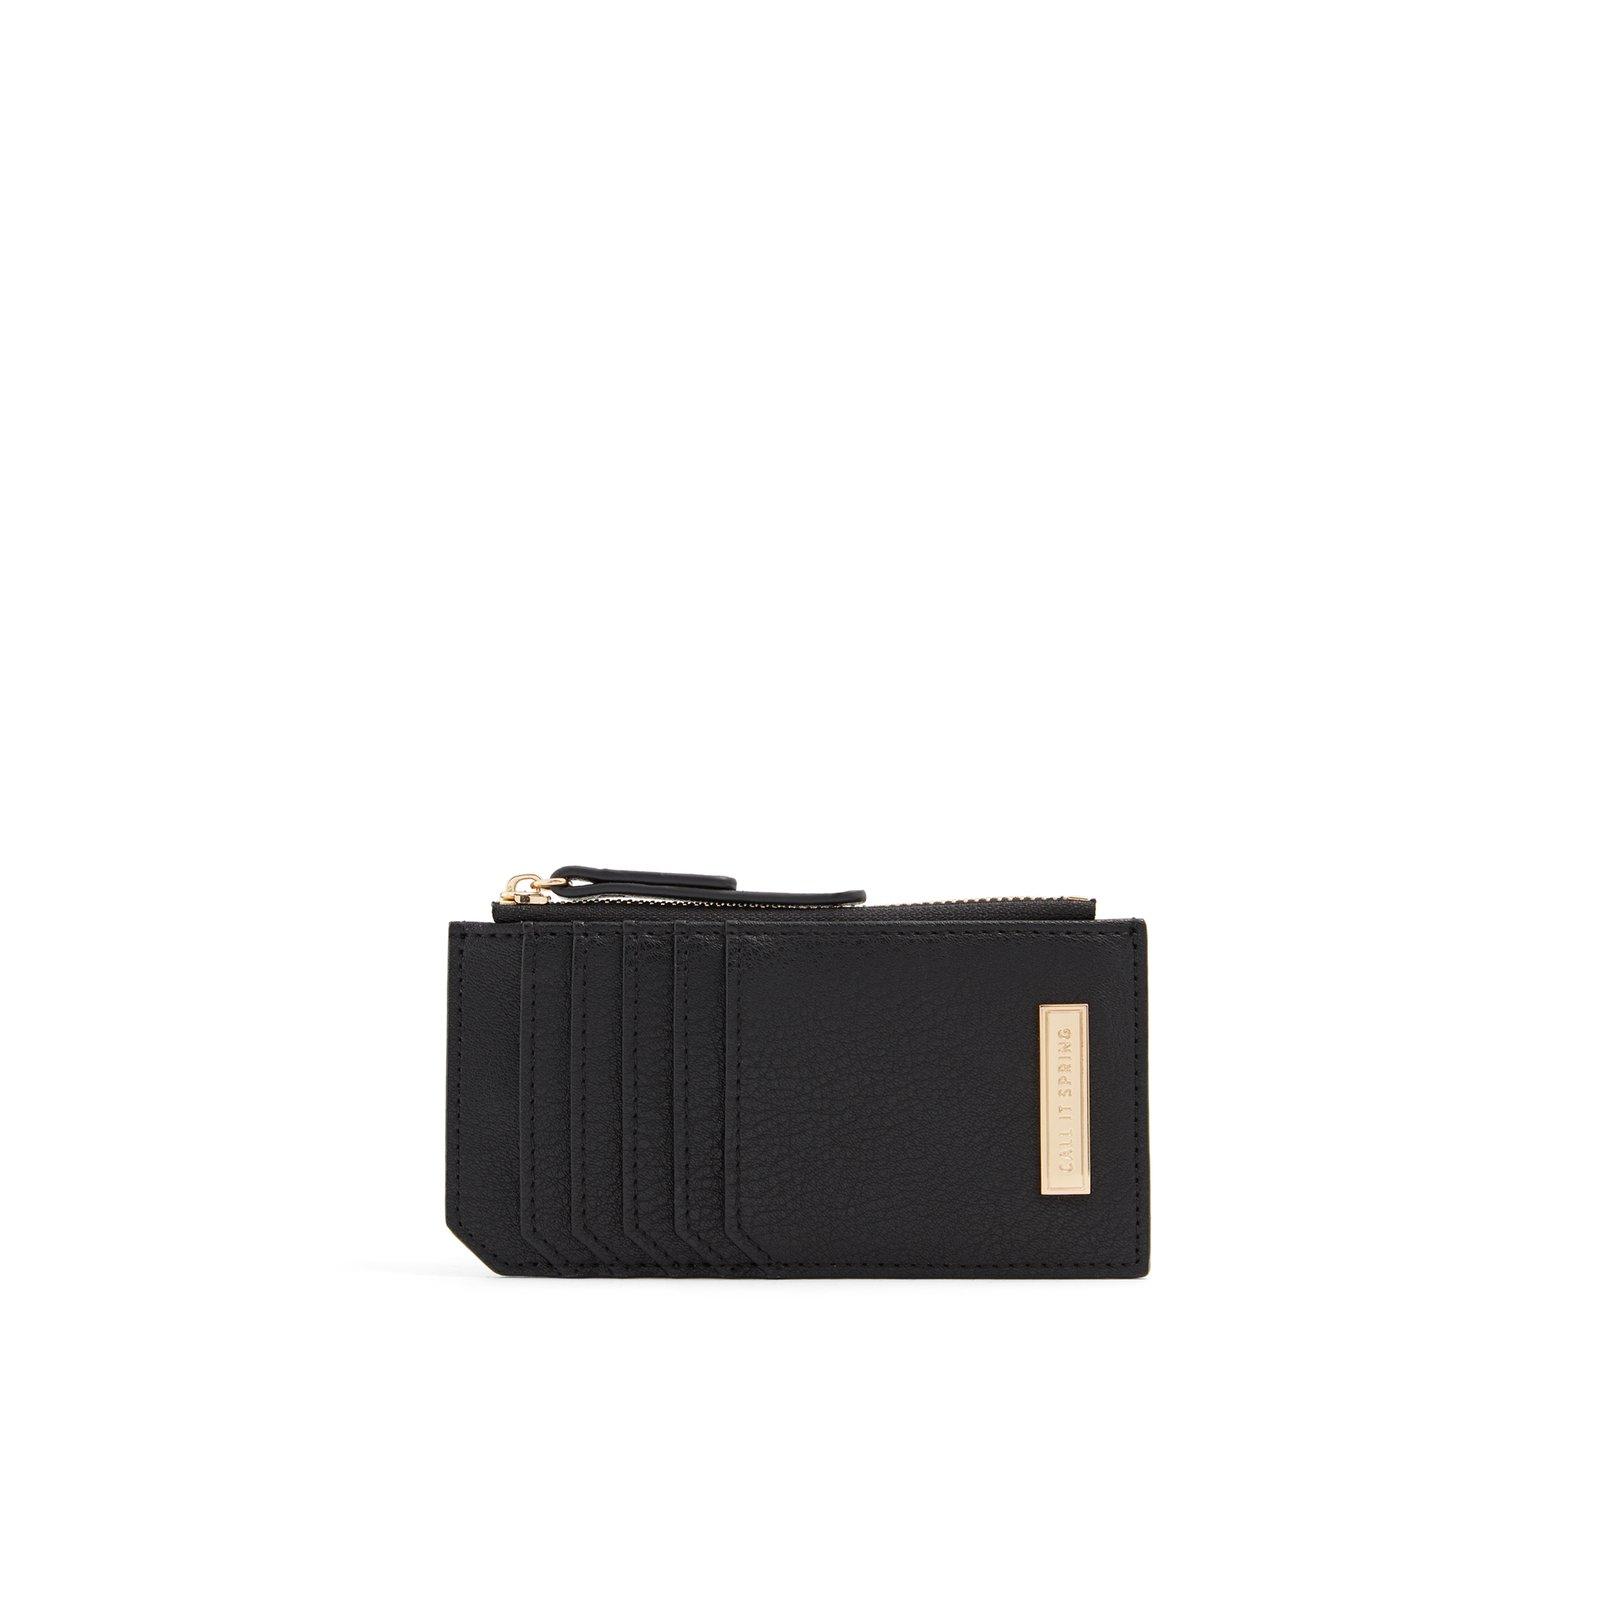 Call It Spring Negruta - Women's Handbags Wallets - Black photo